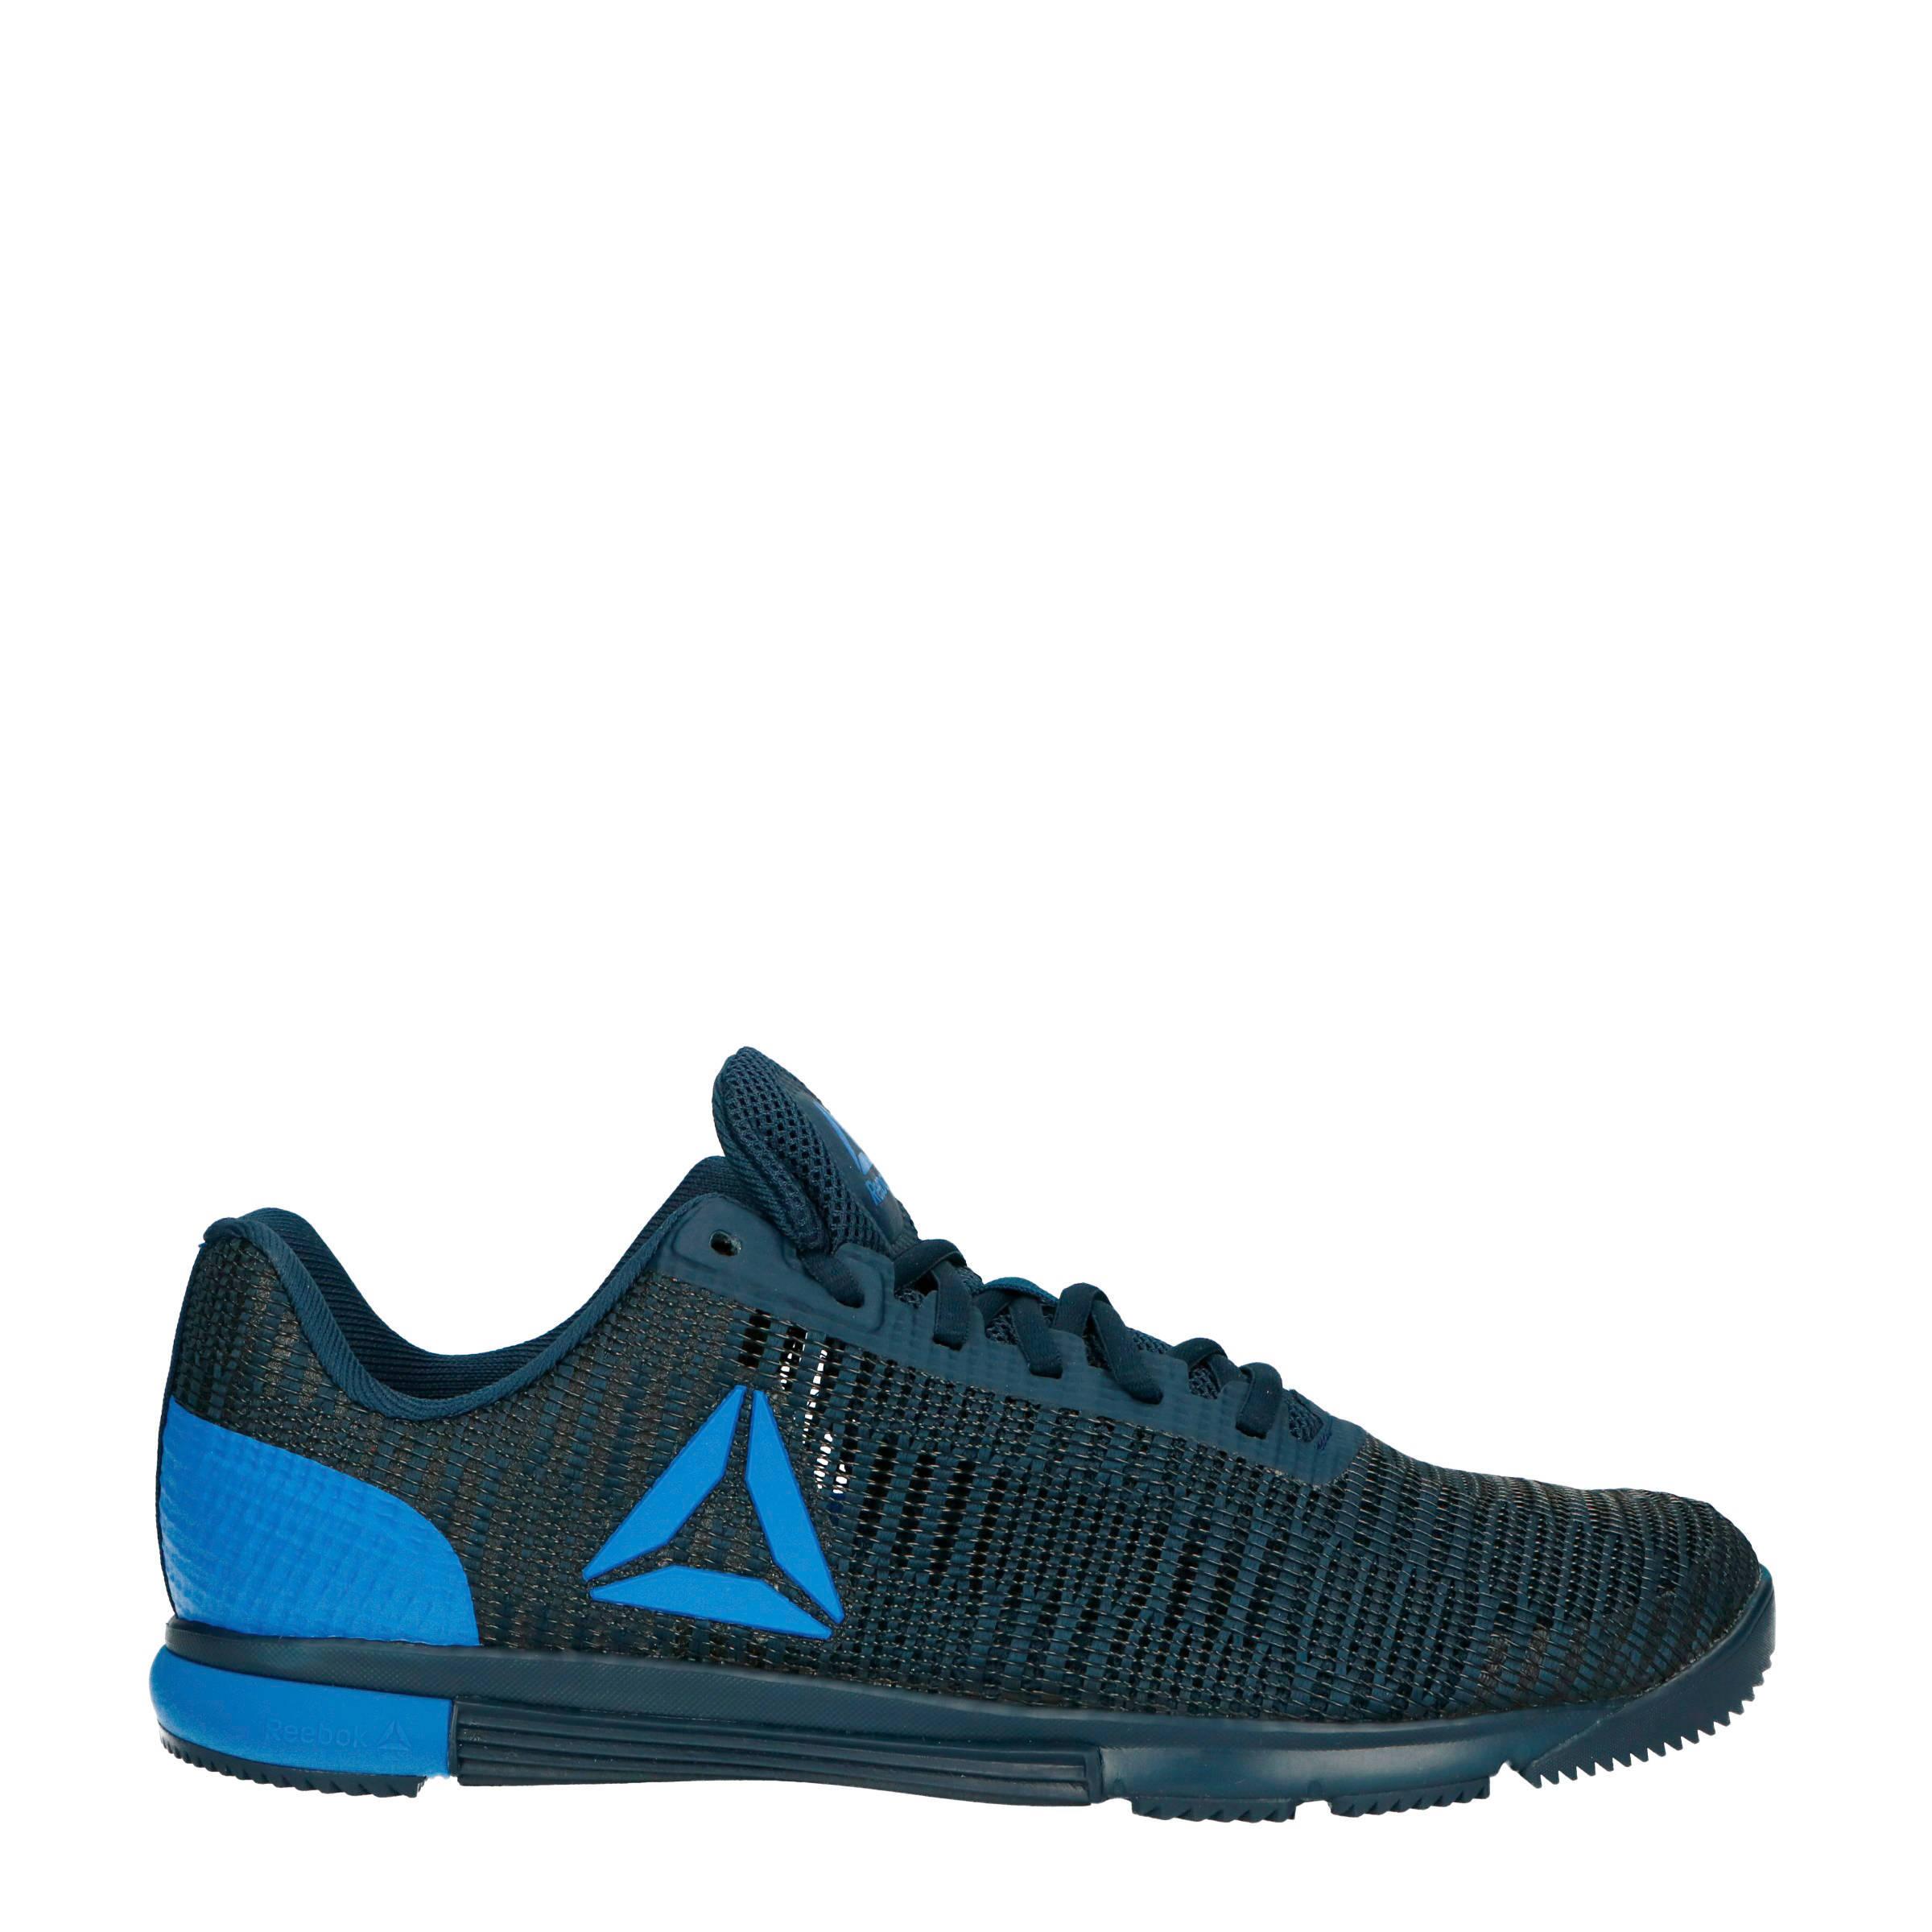 dfd1d628b0b Reebok schoenen TR Flexweave donkerblauw/zwart   wehkamp